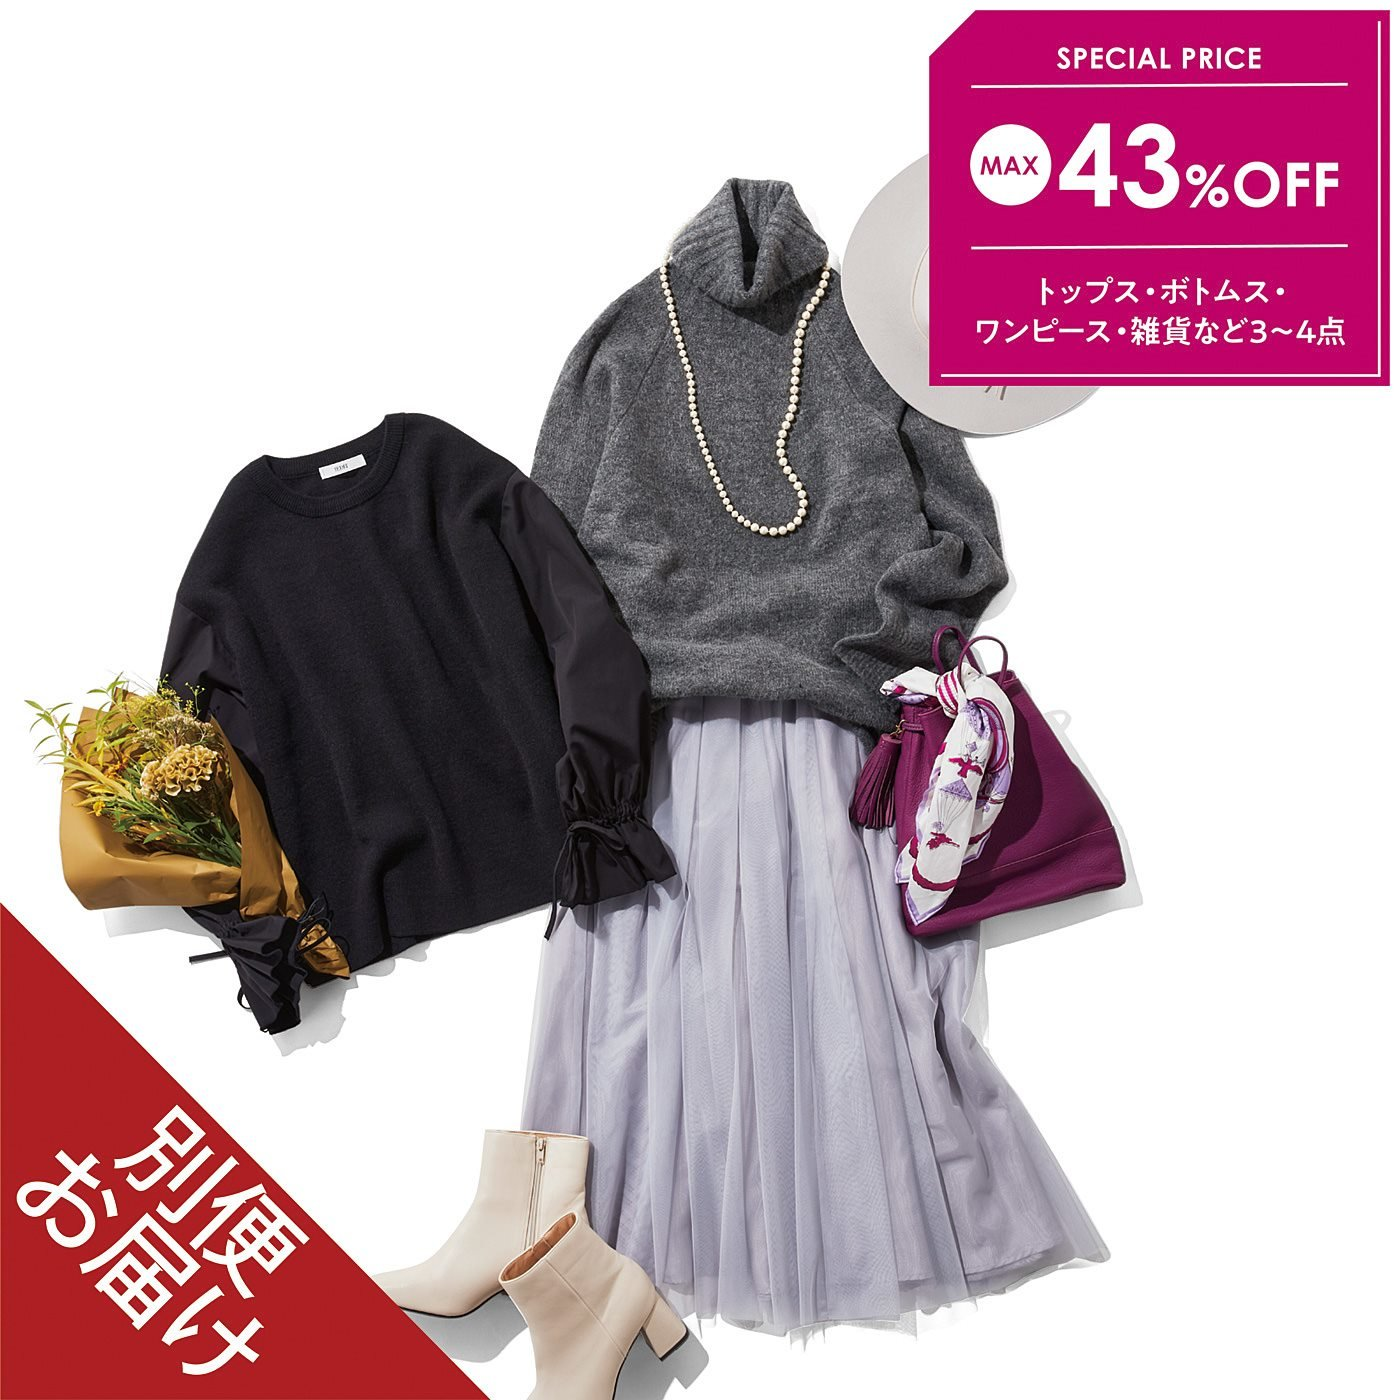 IEDIT[イディット] 冬コーデ広がる 大人のファッションパック